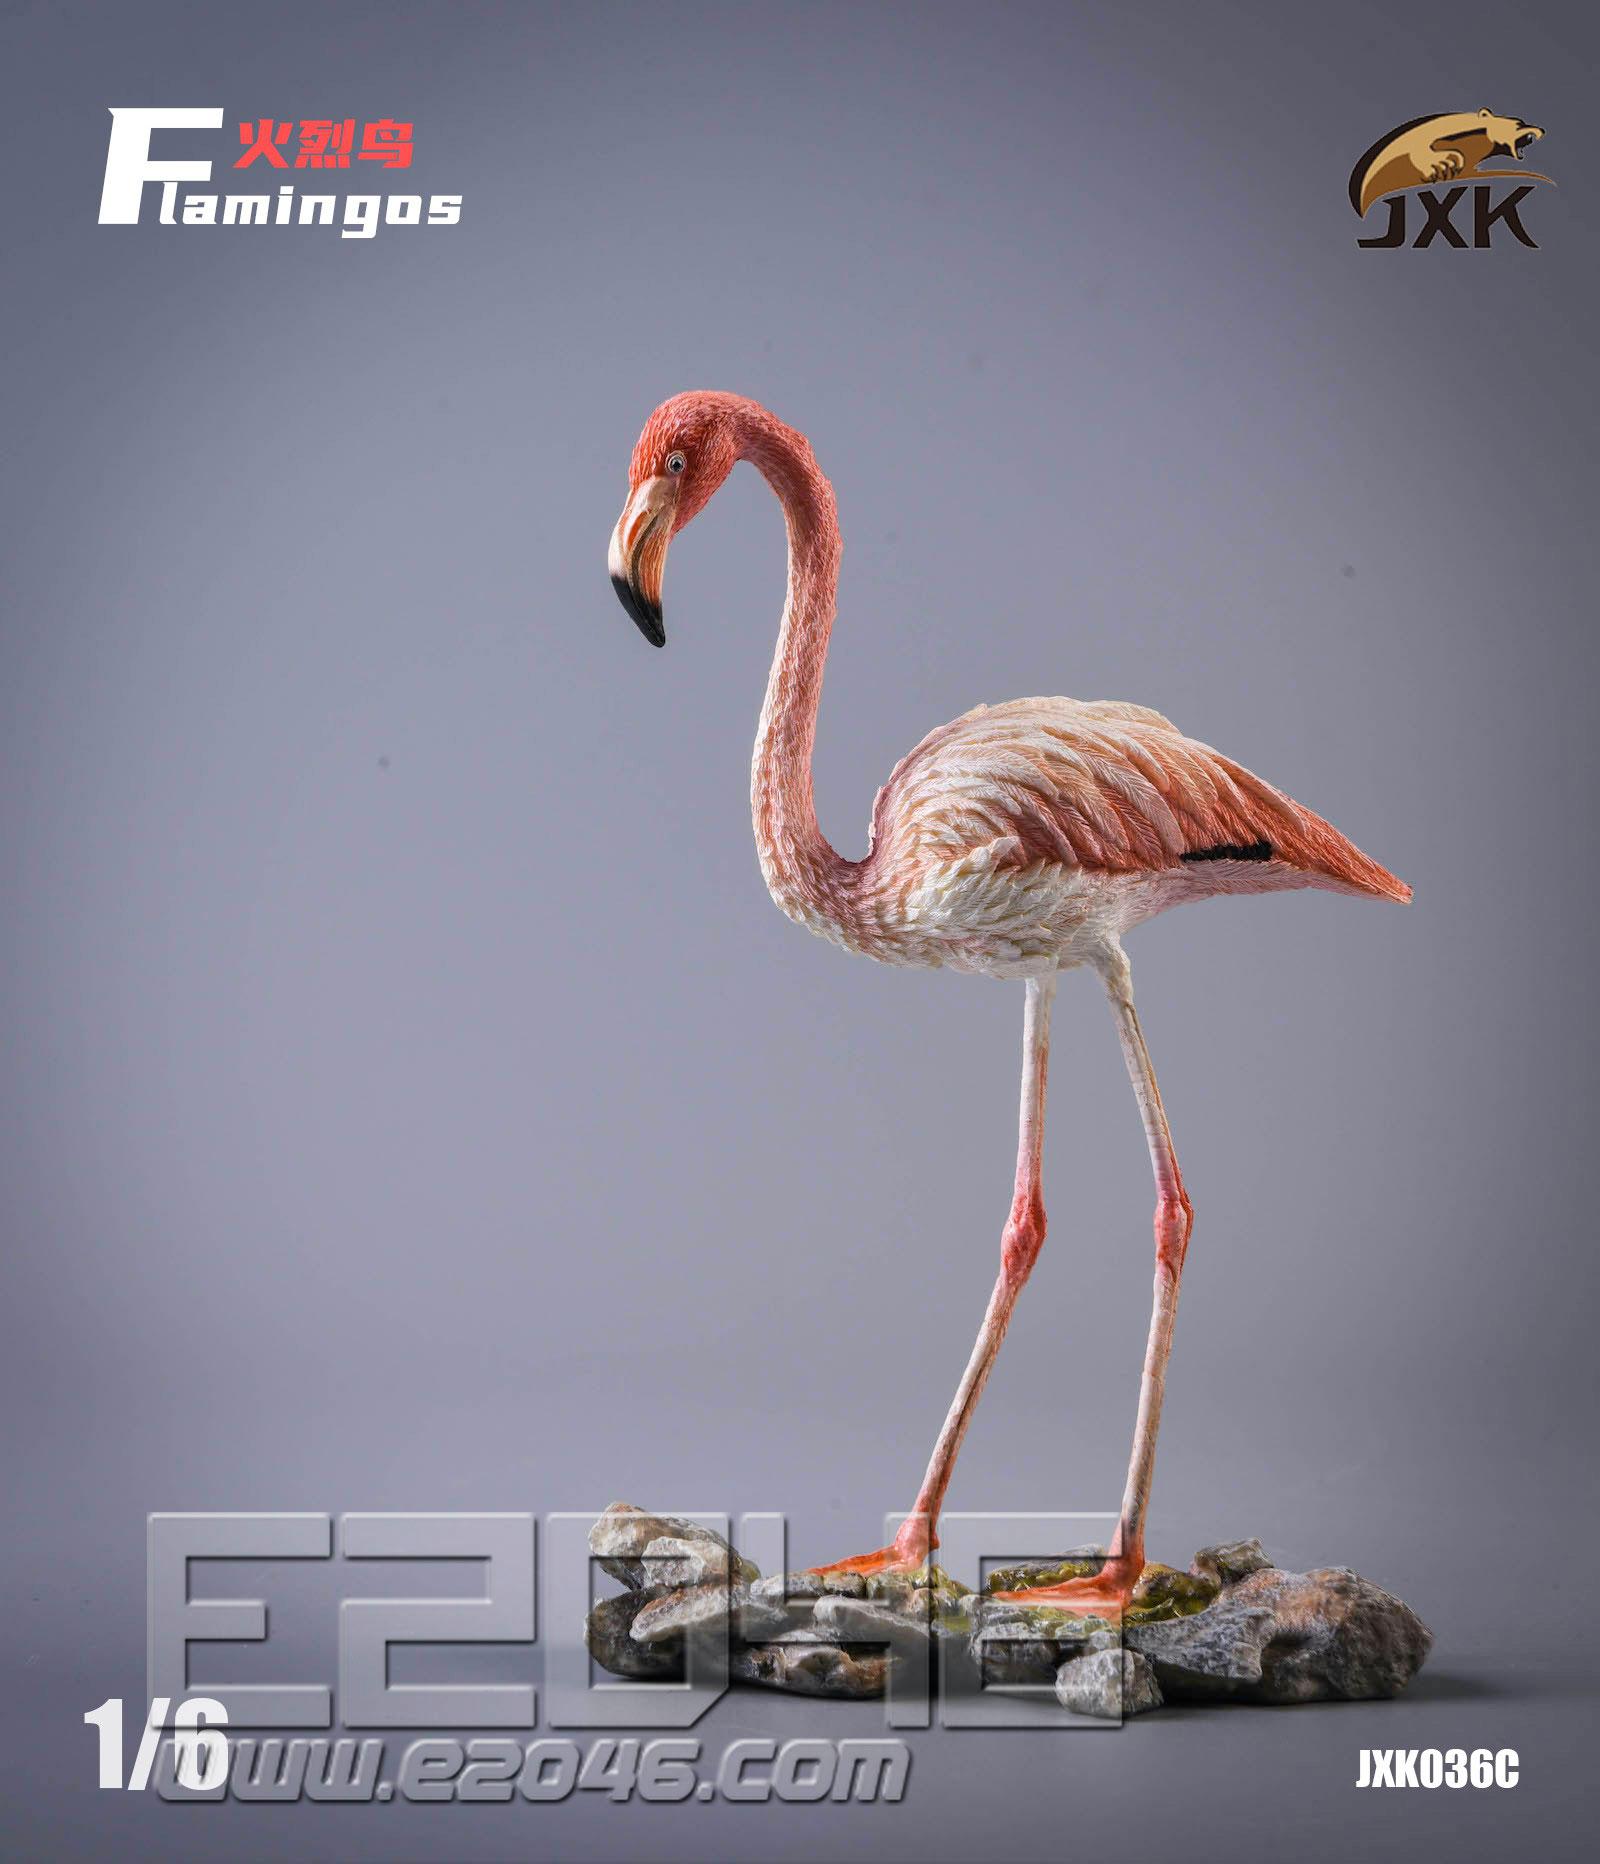 Flamingo C (DOLL)